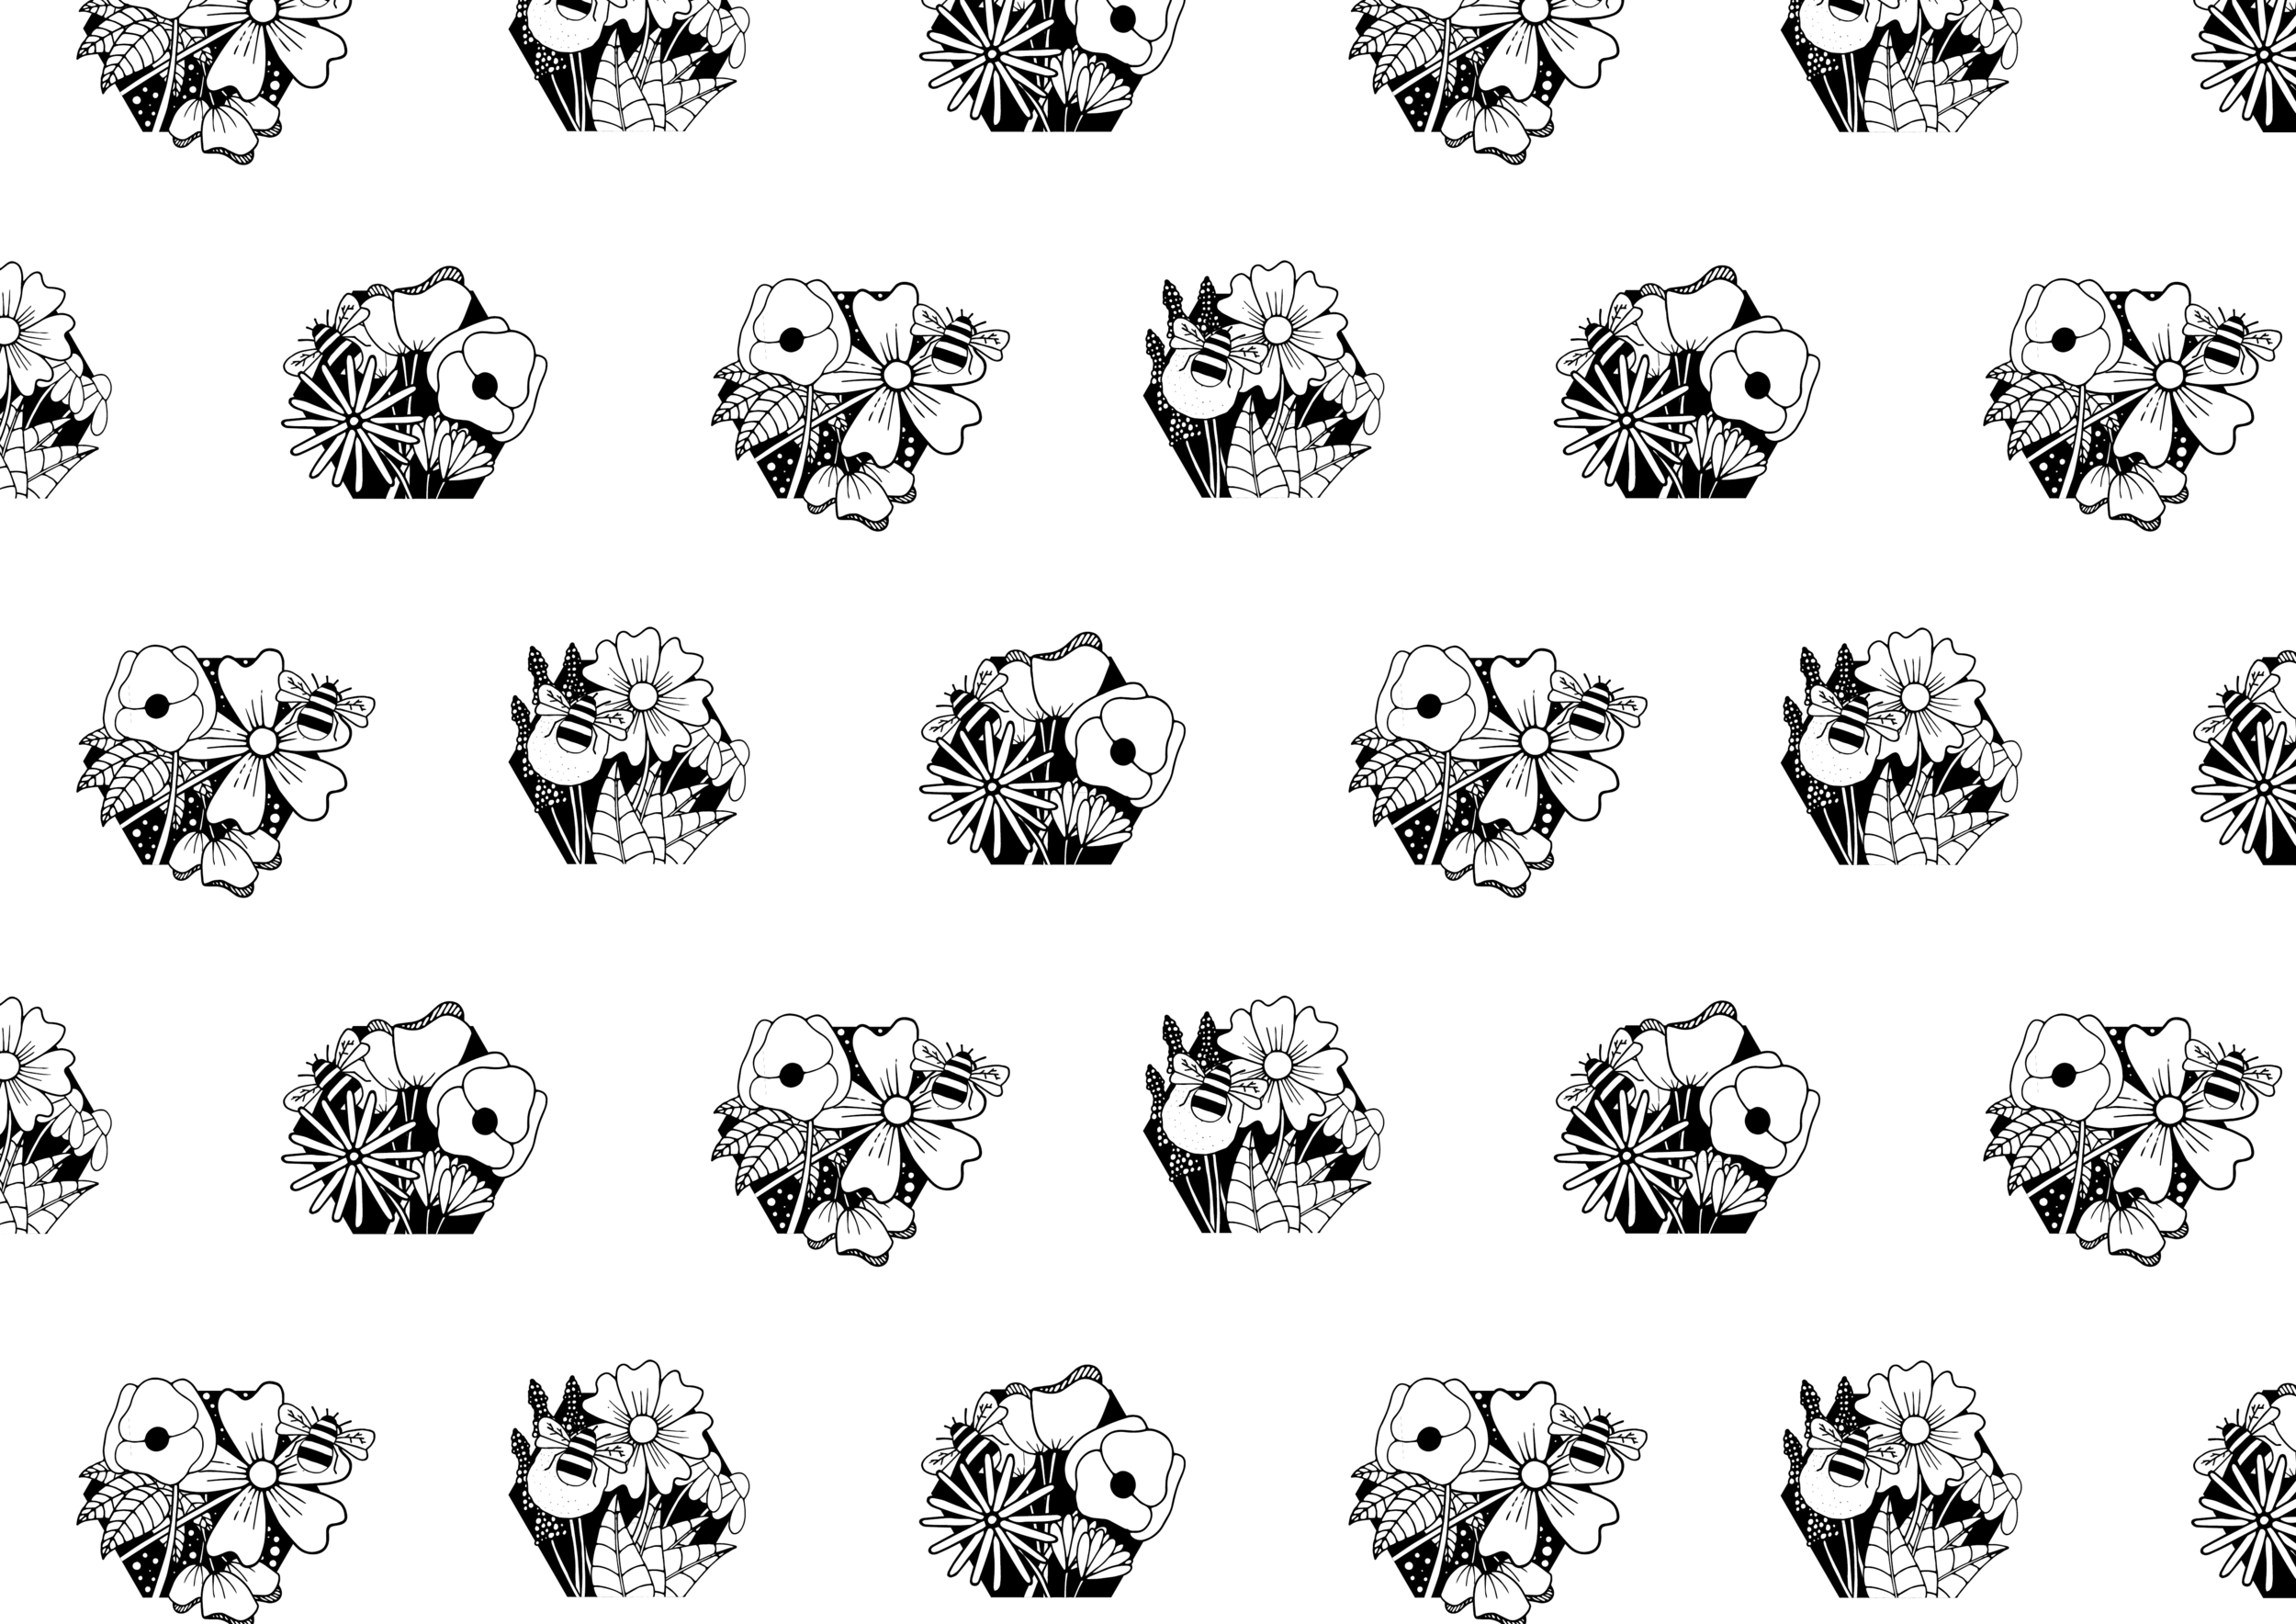 Wall Paper Mockups-02.png